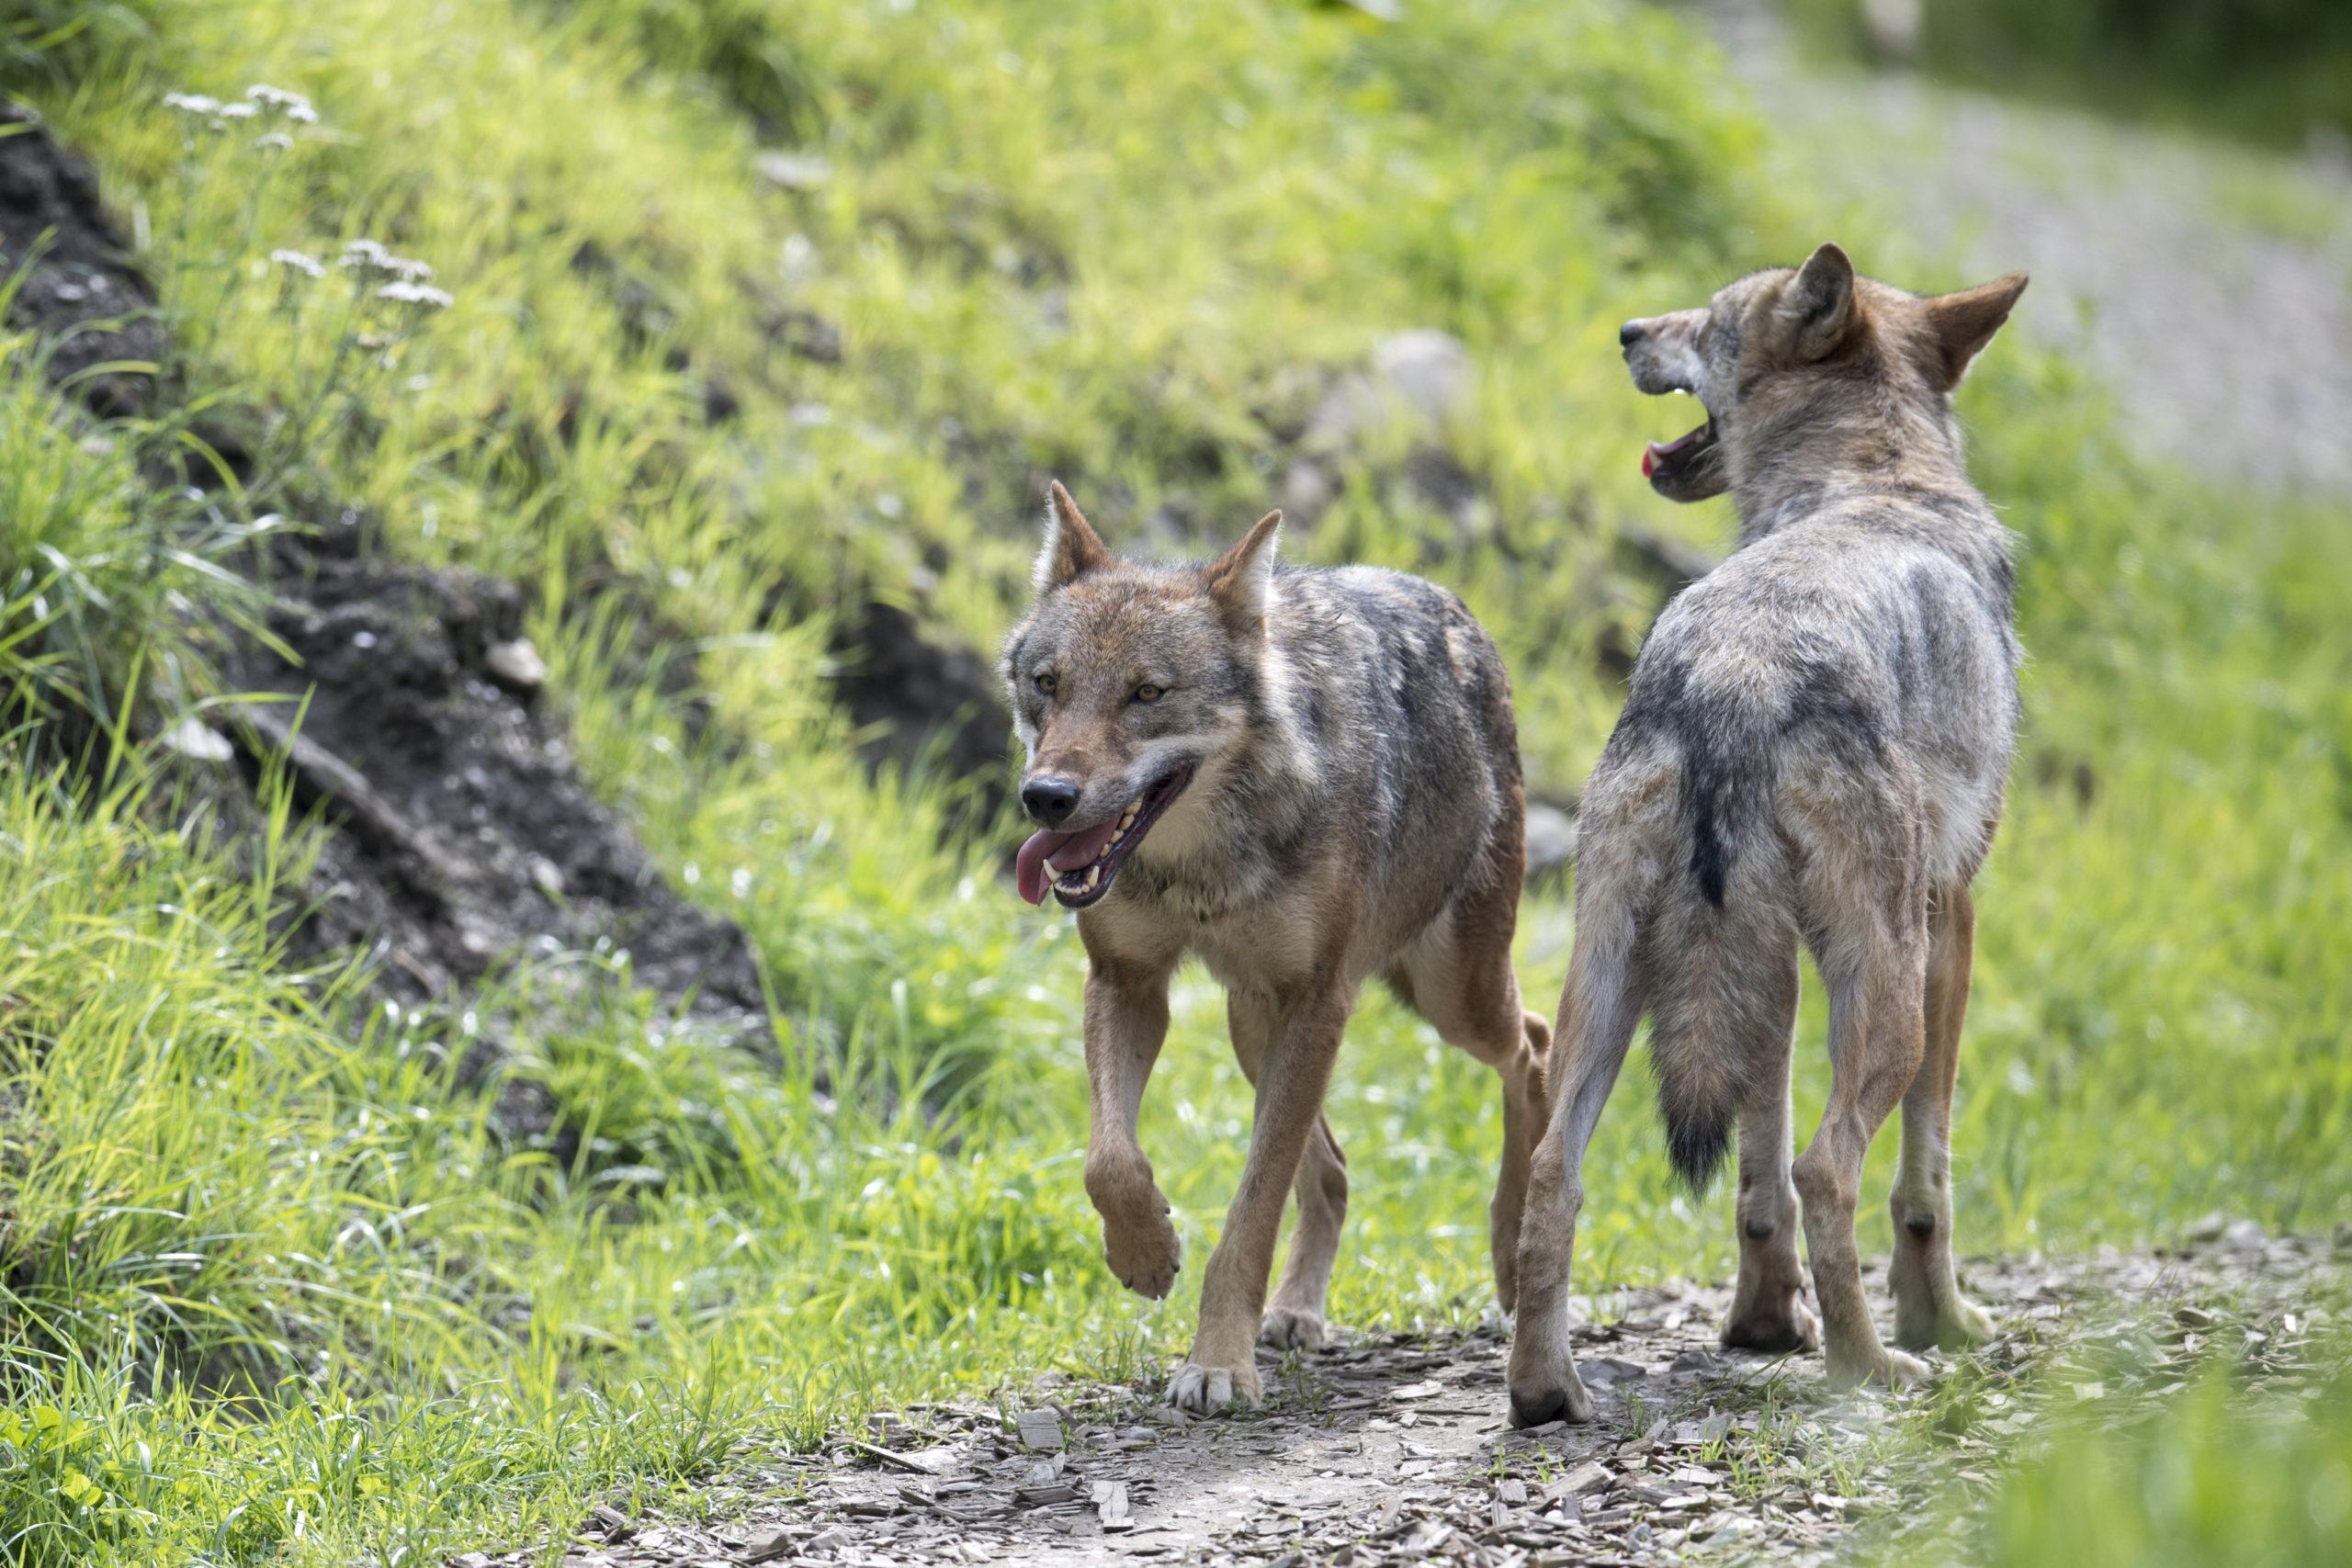 c Daniel Schwab - Naturfotografie Die Wölfe im Wildpark.